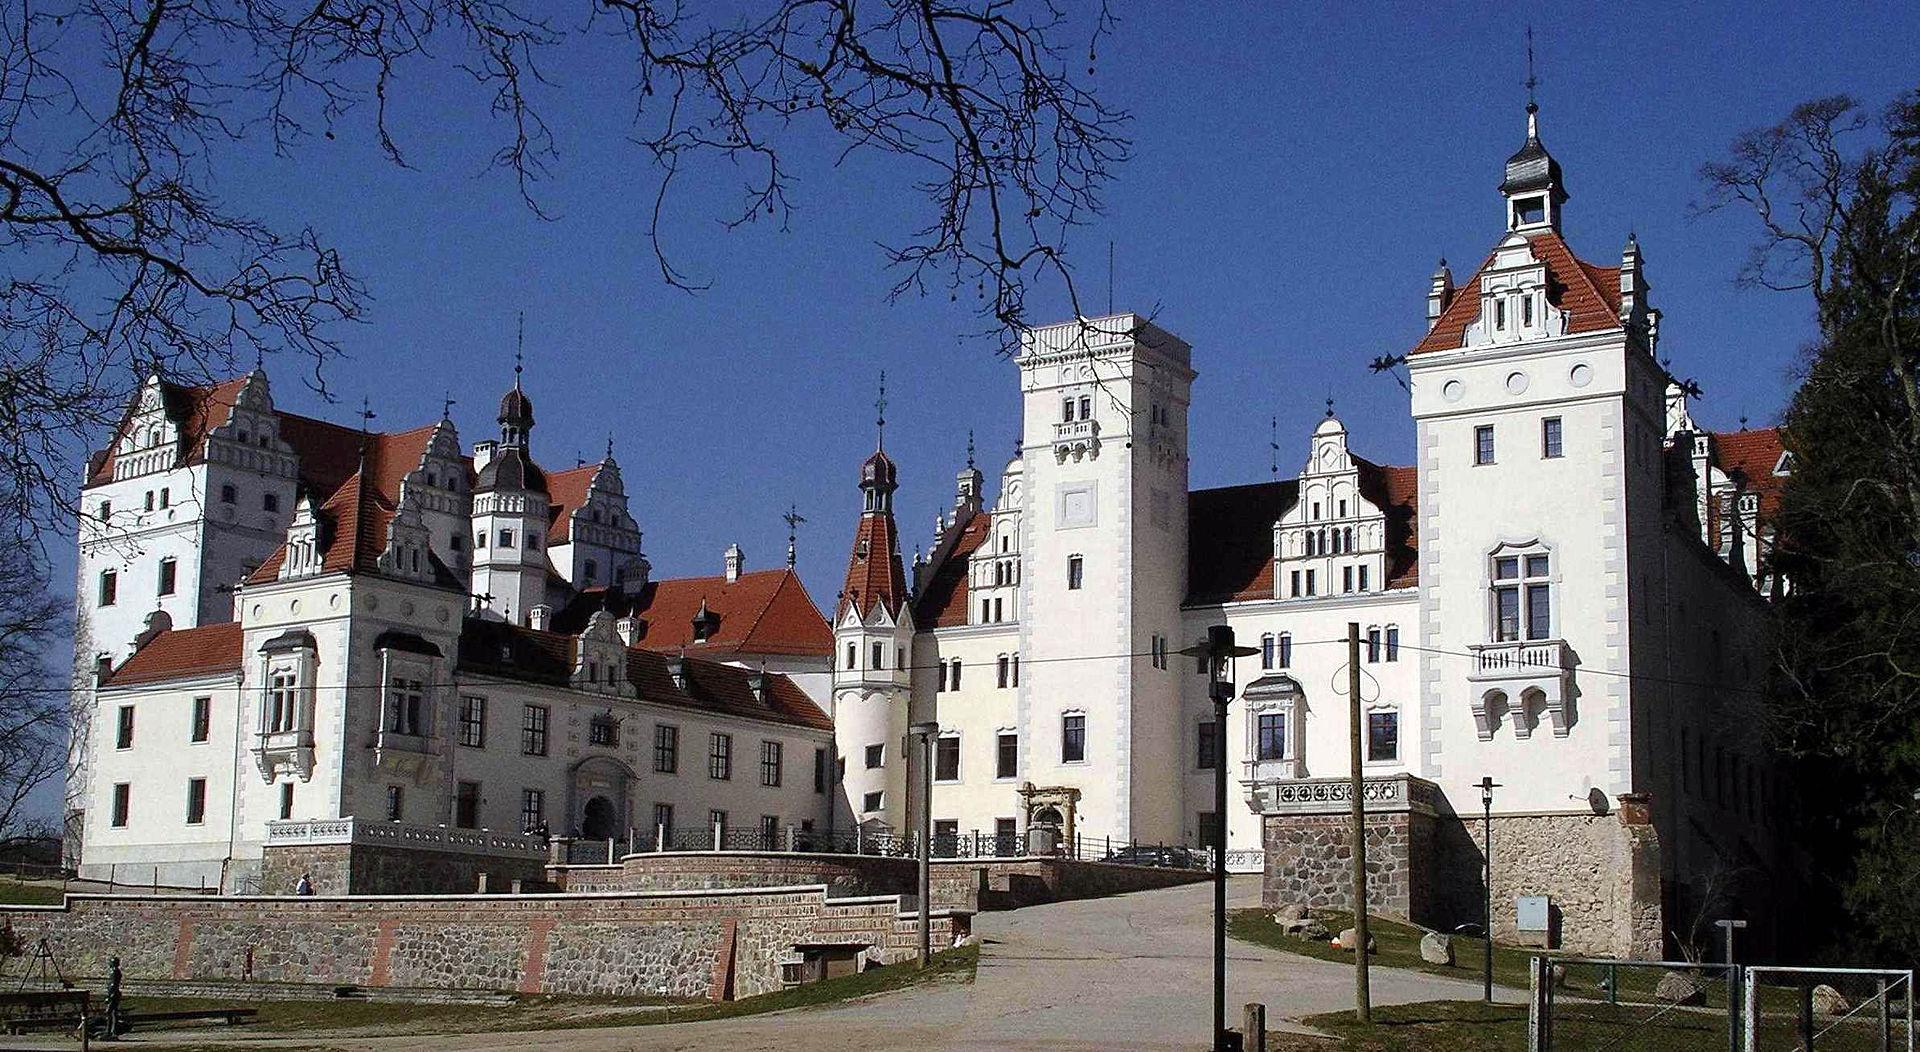 Bild Schloss Boitzenburg